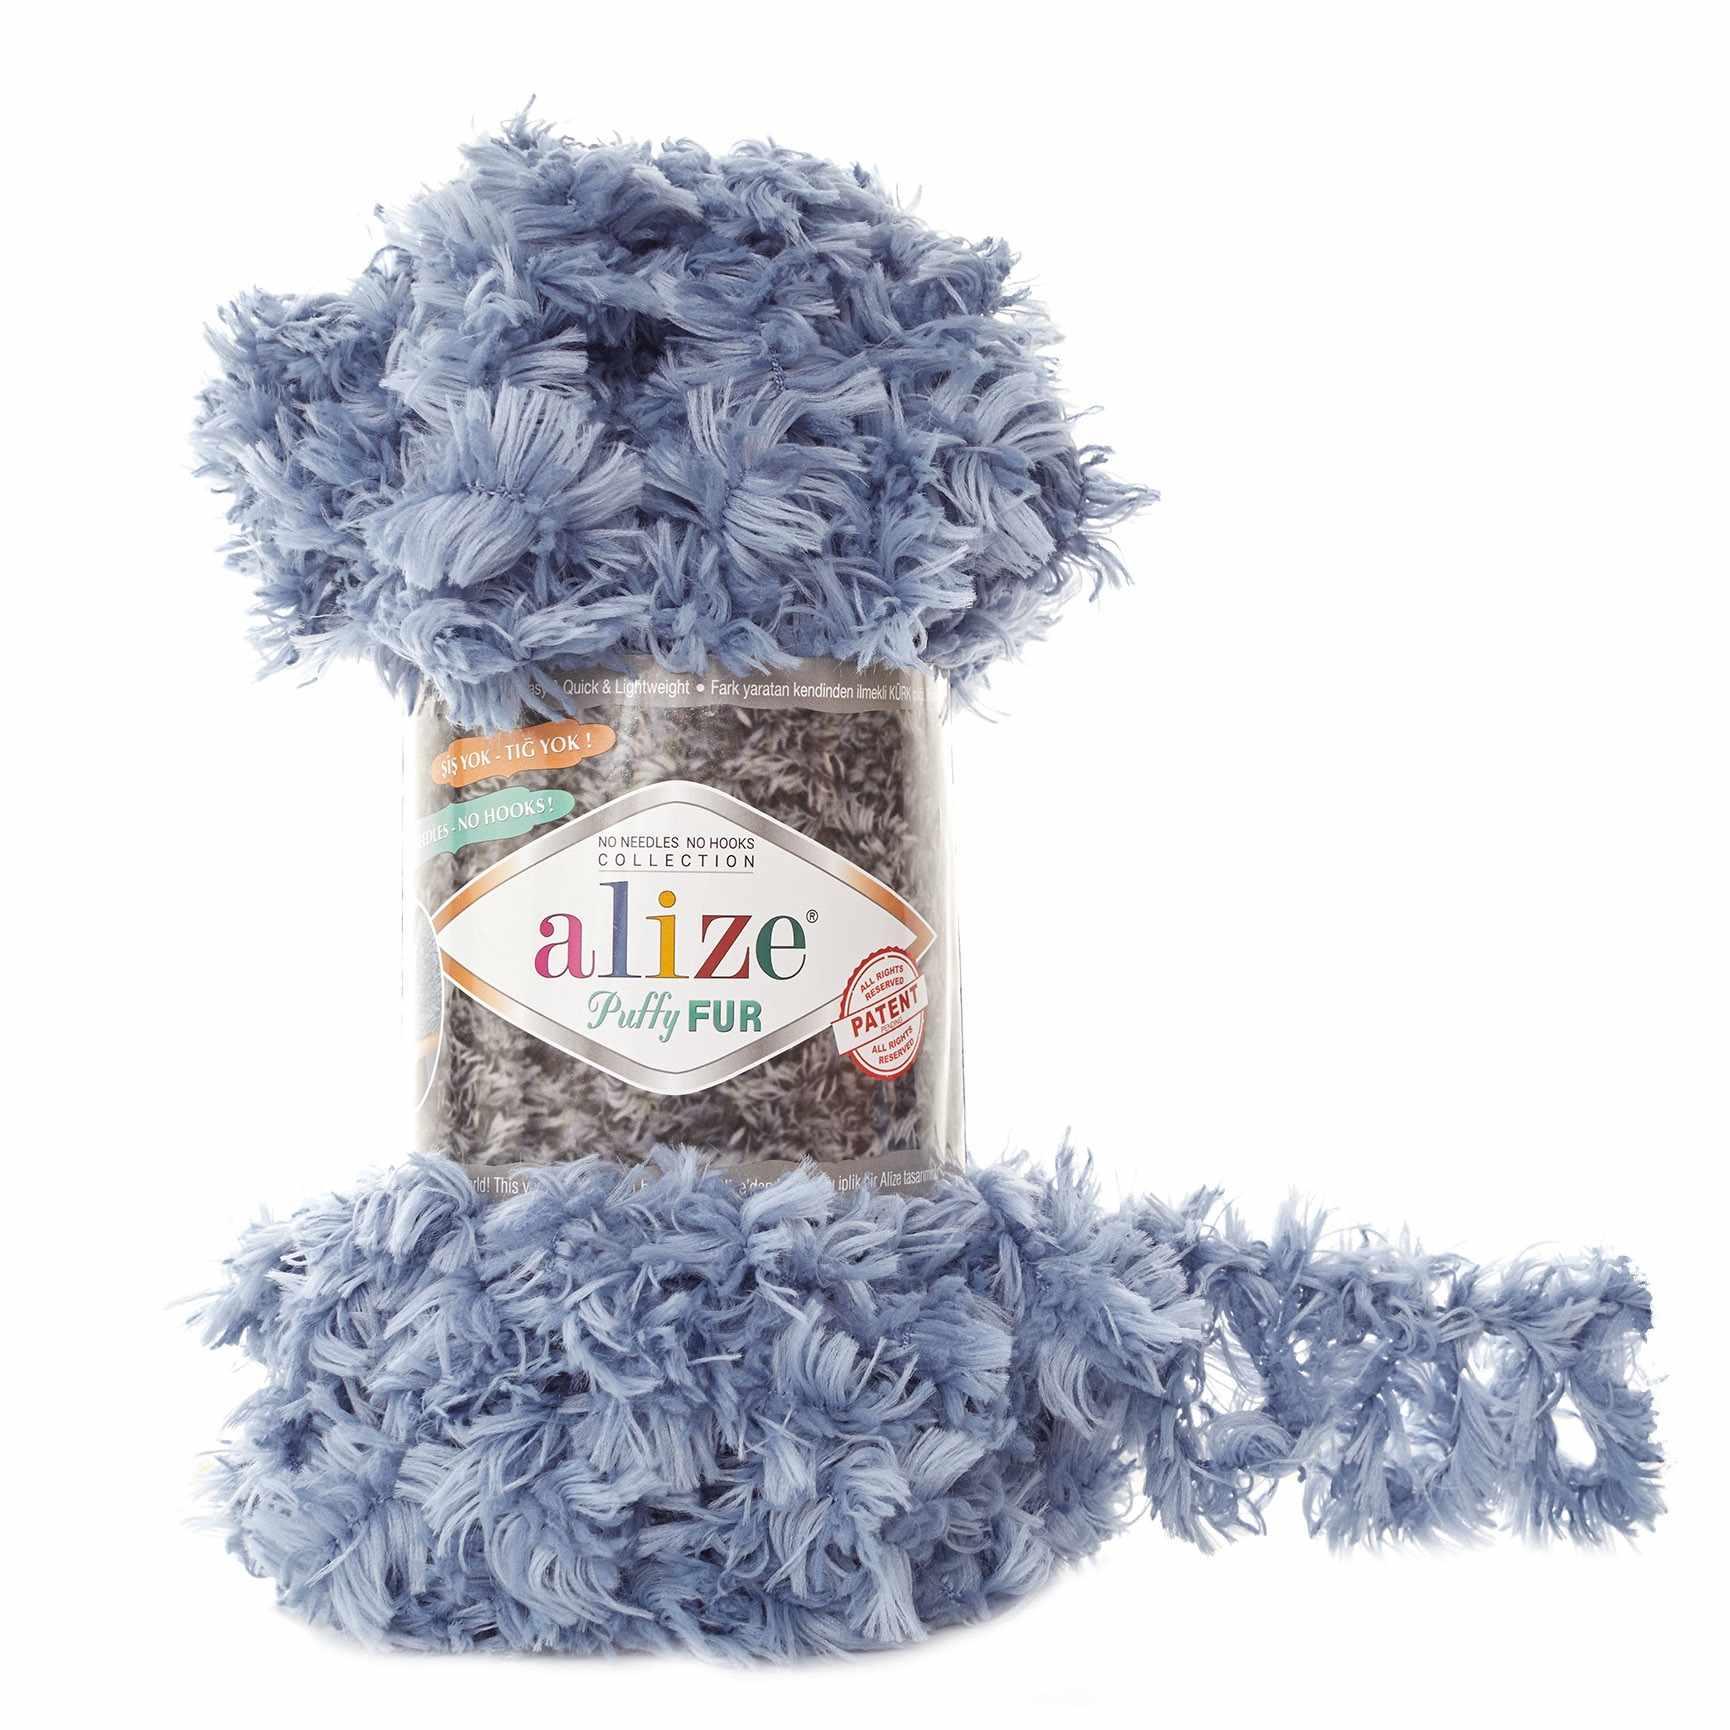 Пряжа Alize Puffy Fur Цвет.6106 Голубой